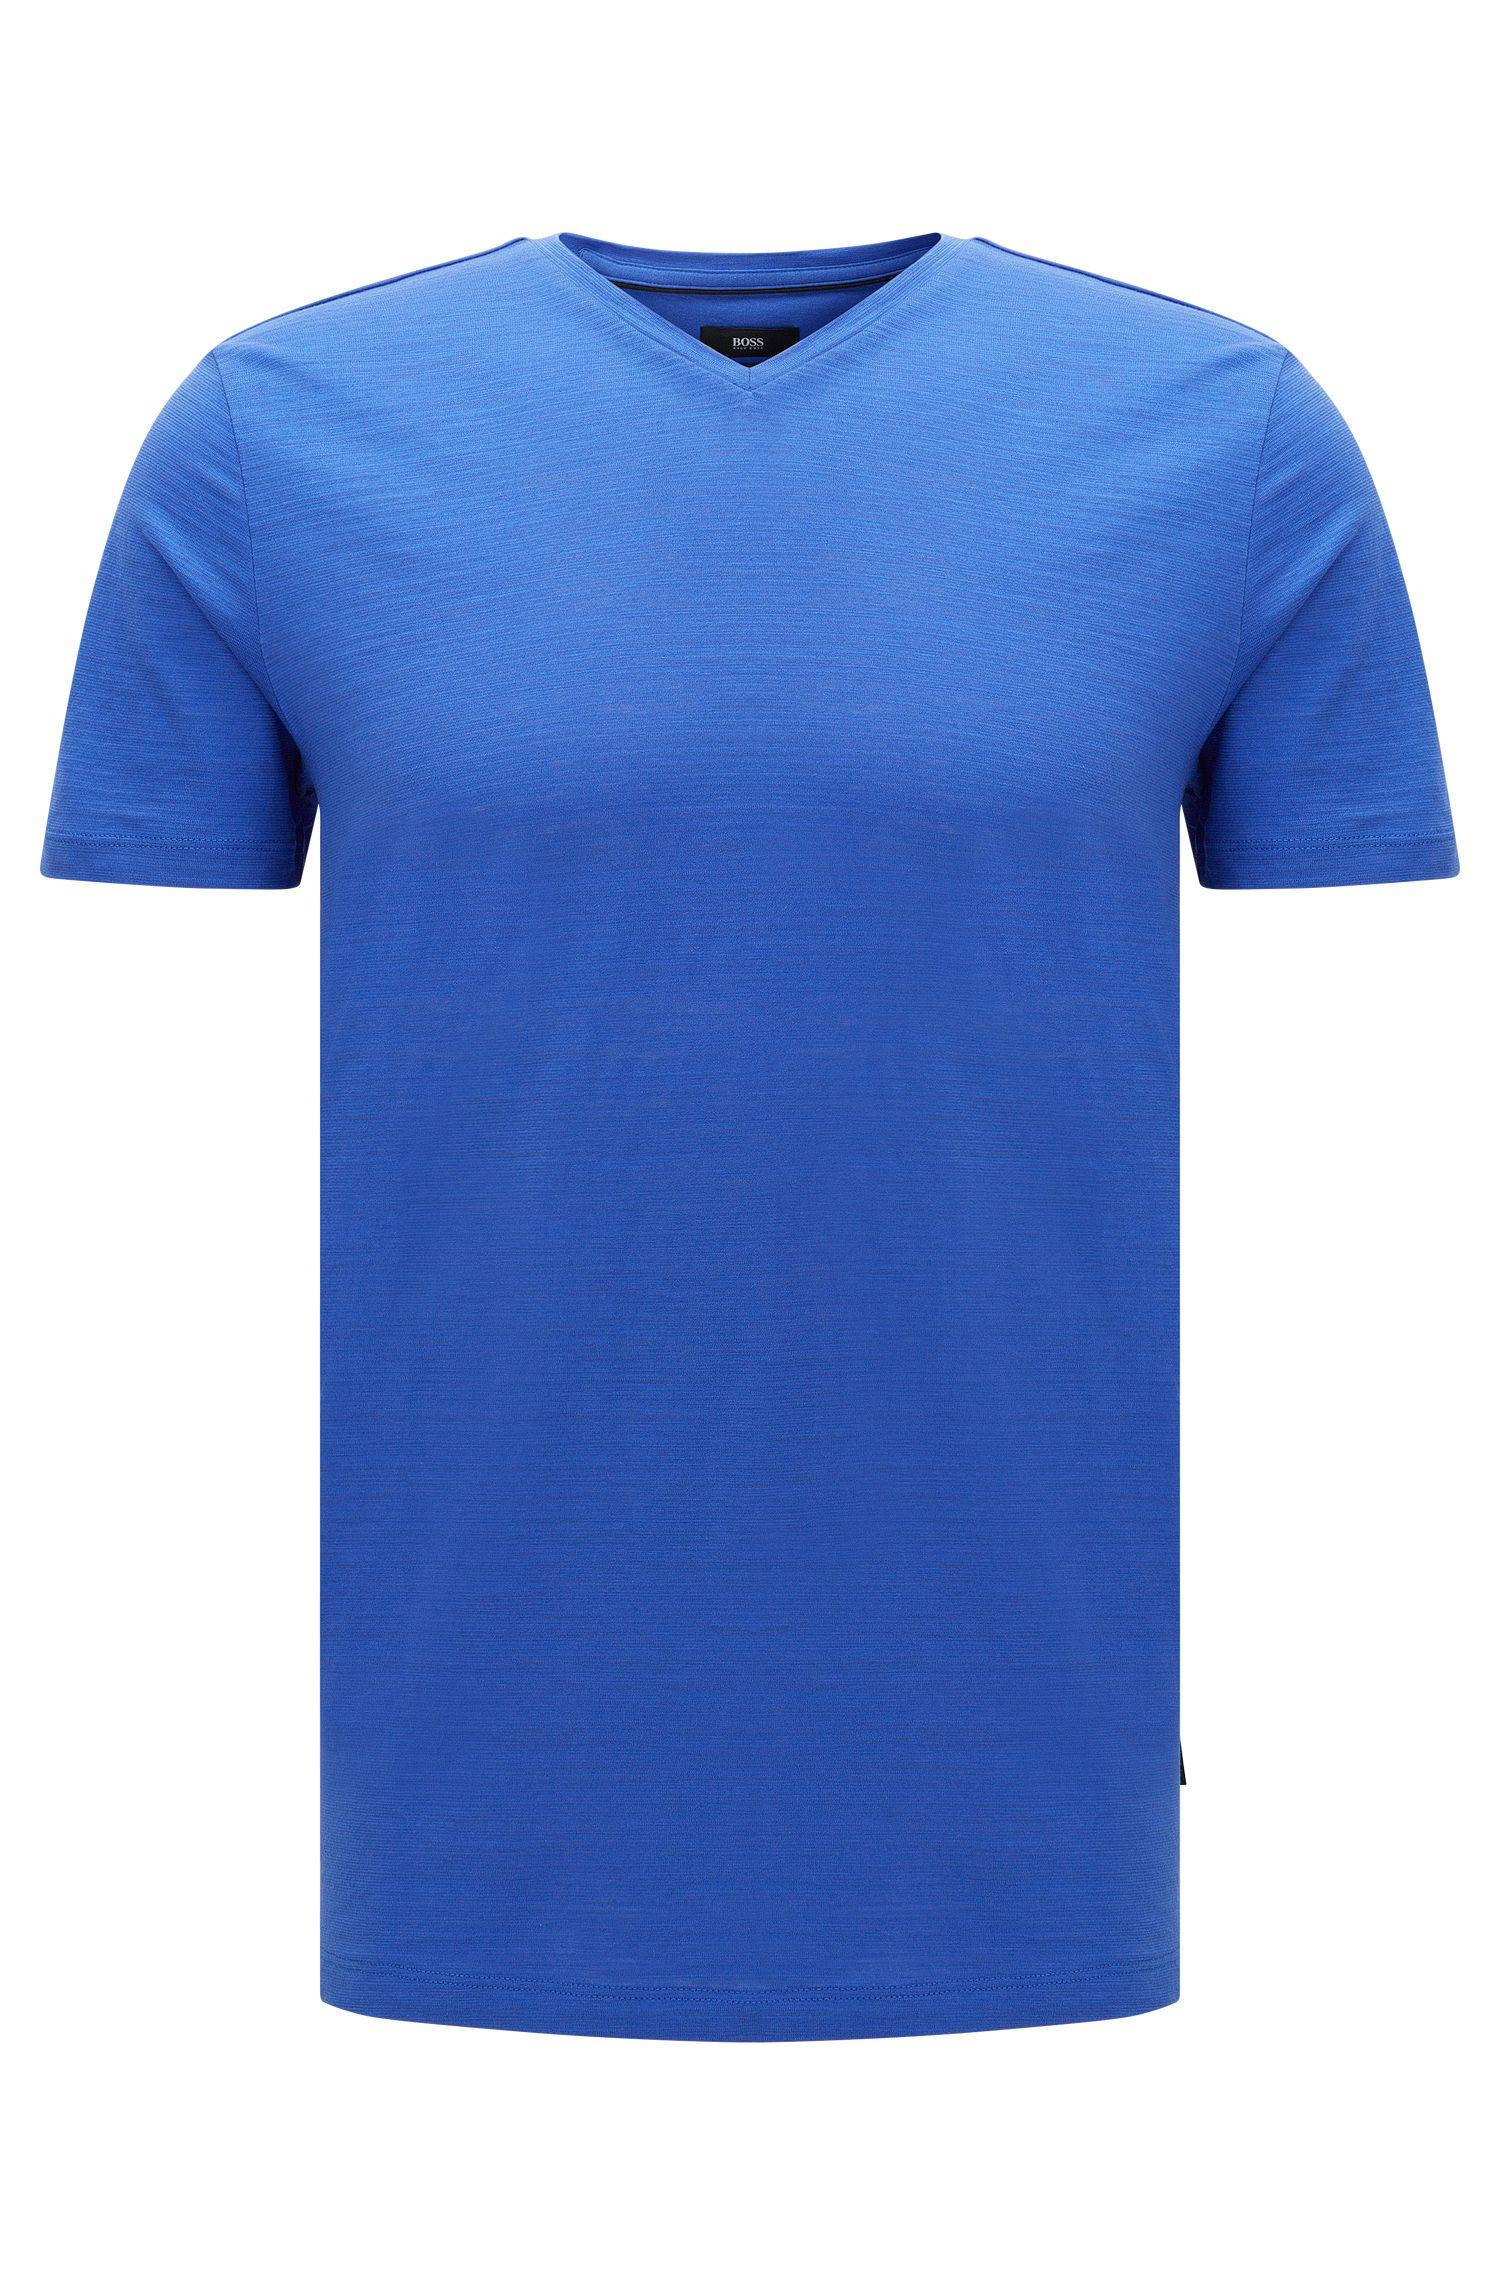 'Tilson' | Mercerized Cotton T-Shirt